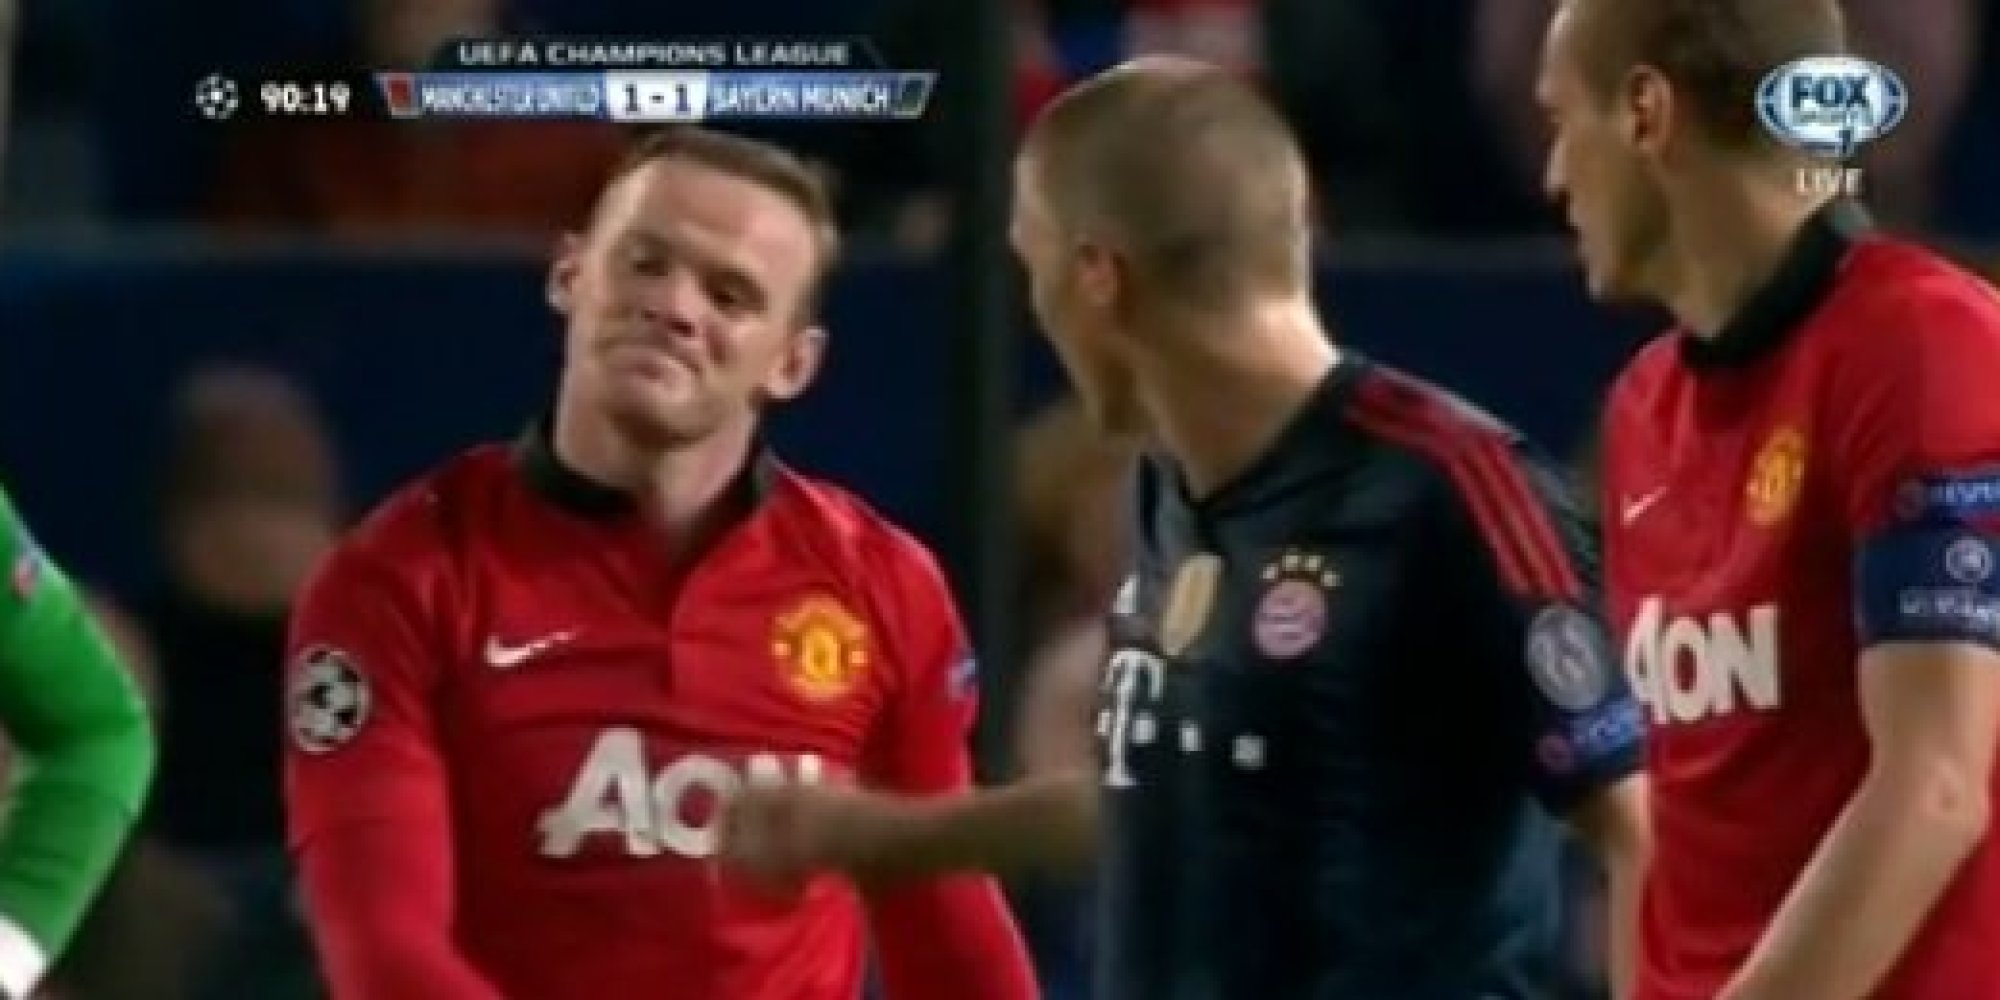 Liga Champions  - Kartu Merah Schweinsteiger, Ini Komentar Rooney